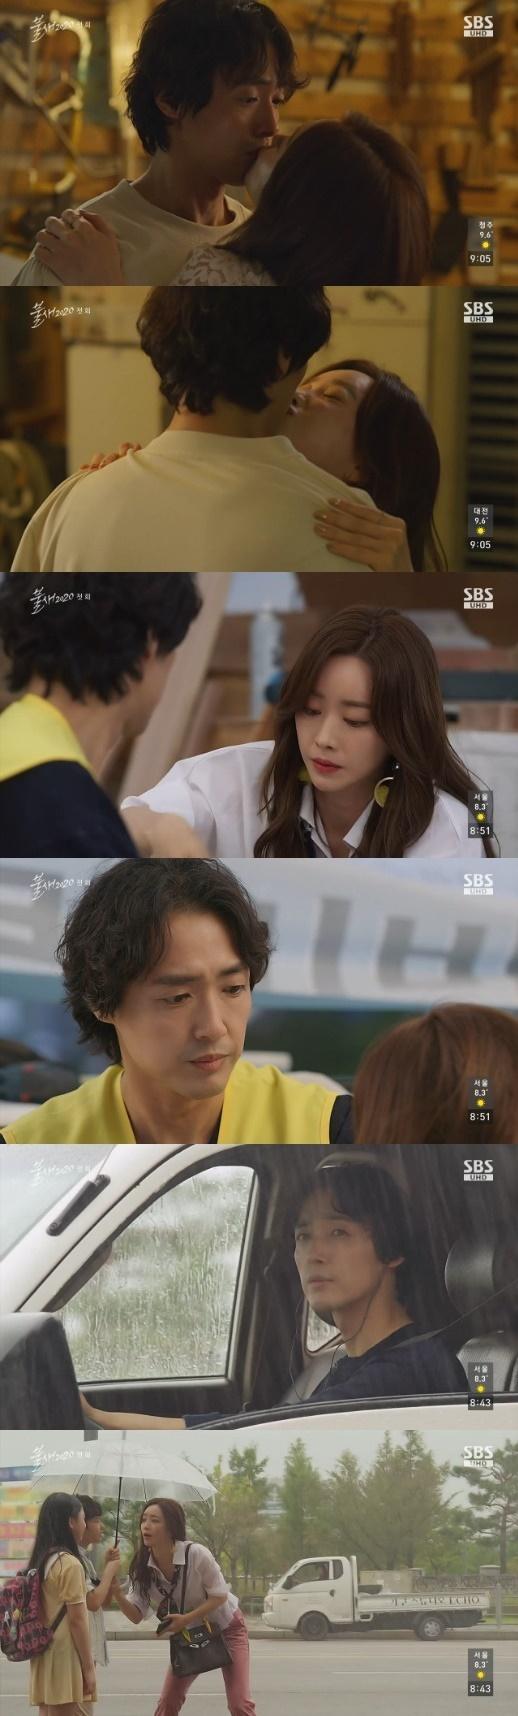 SBS '불새 2020' 방송 화면 캡처 © 뉴스1